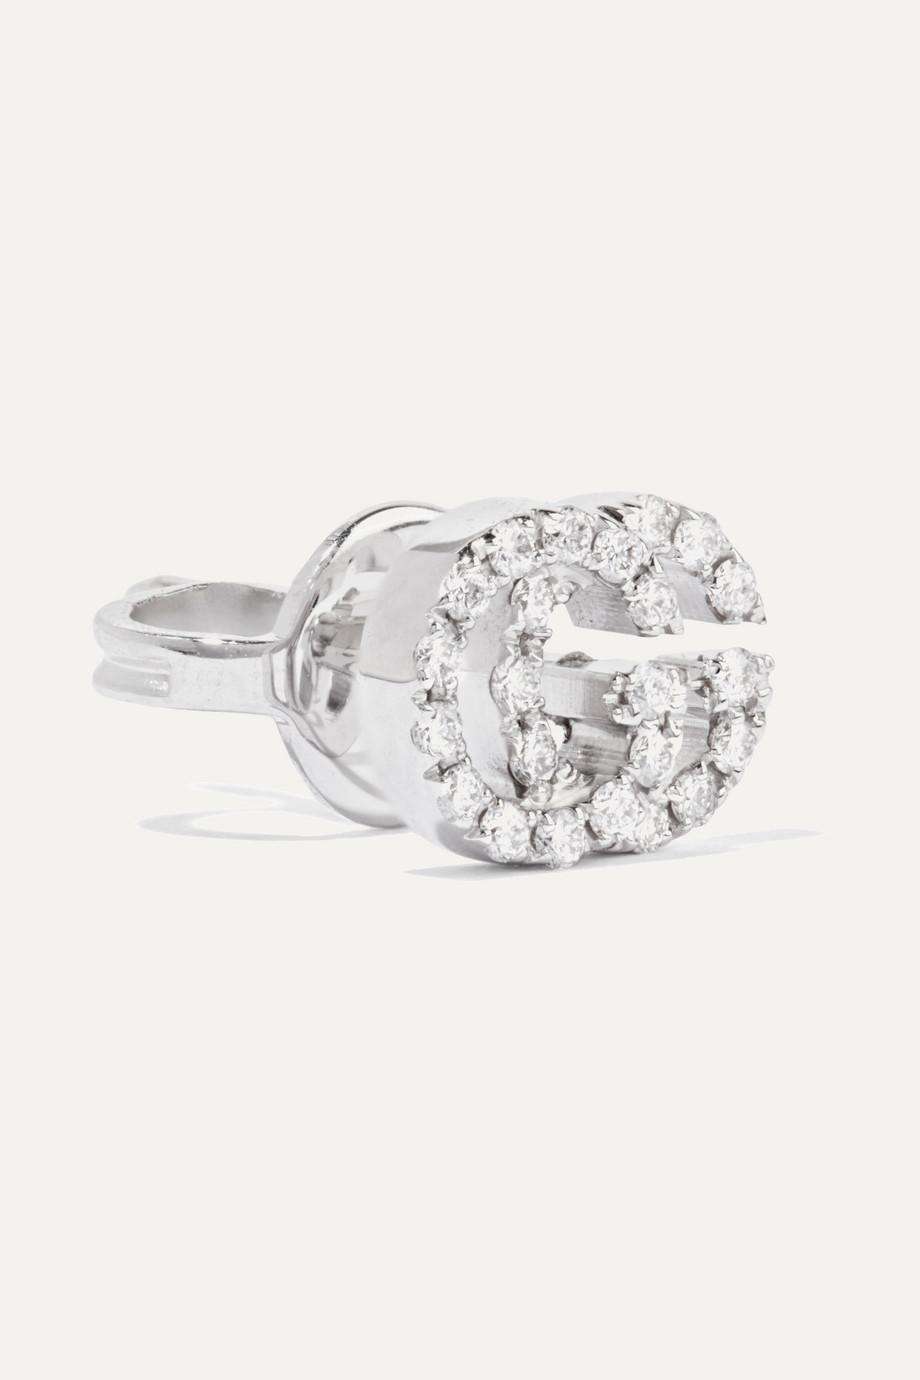 Gucci 18-karat white gold diamond earrings